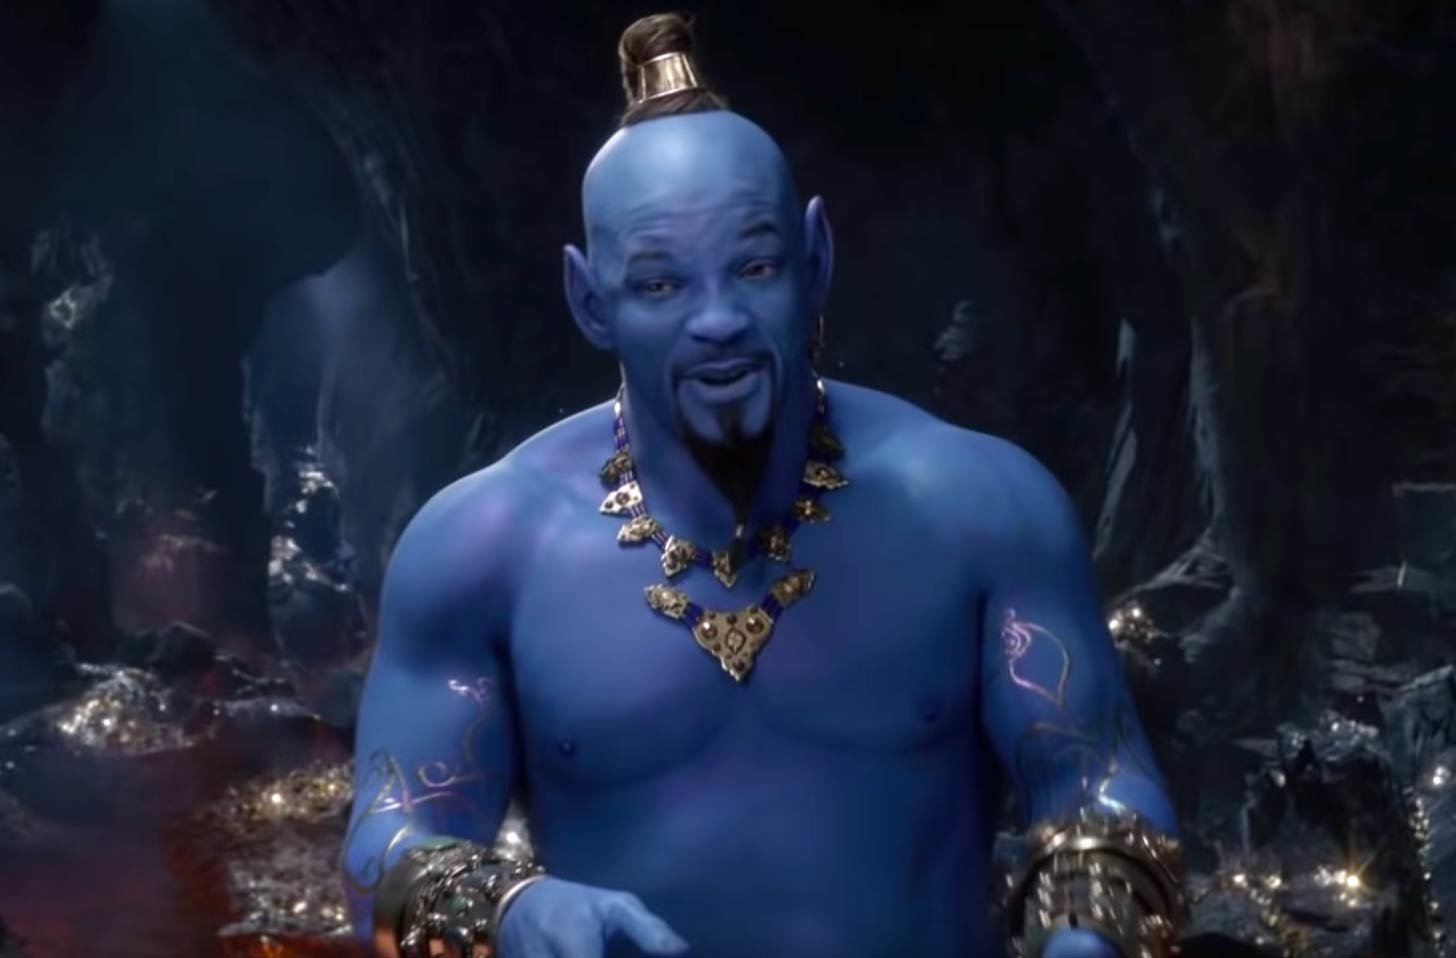 "<p>Кадр видео&nbsp;<a href=""https://www.youtube.com/channel/UCuaFvcY4MhZY3U43mMt1dYQ"">Walt Disney Studios</a></p> <div> <div><span></span></div> </div>"